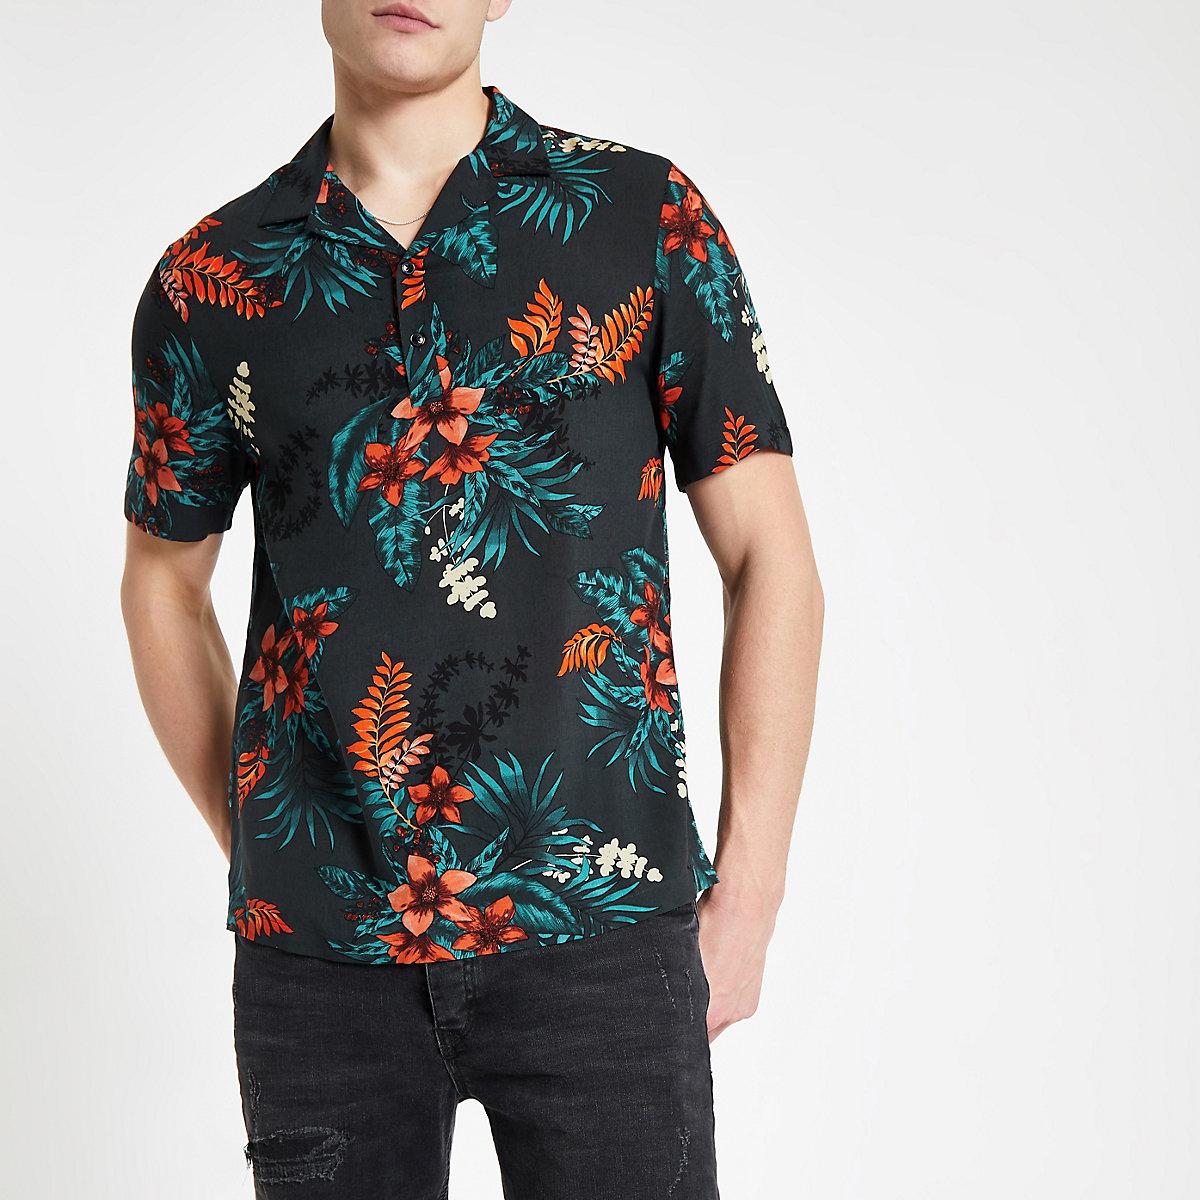 Black floral three button short sleeve shirt